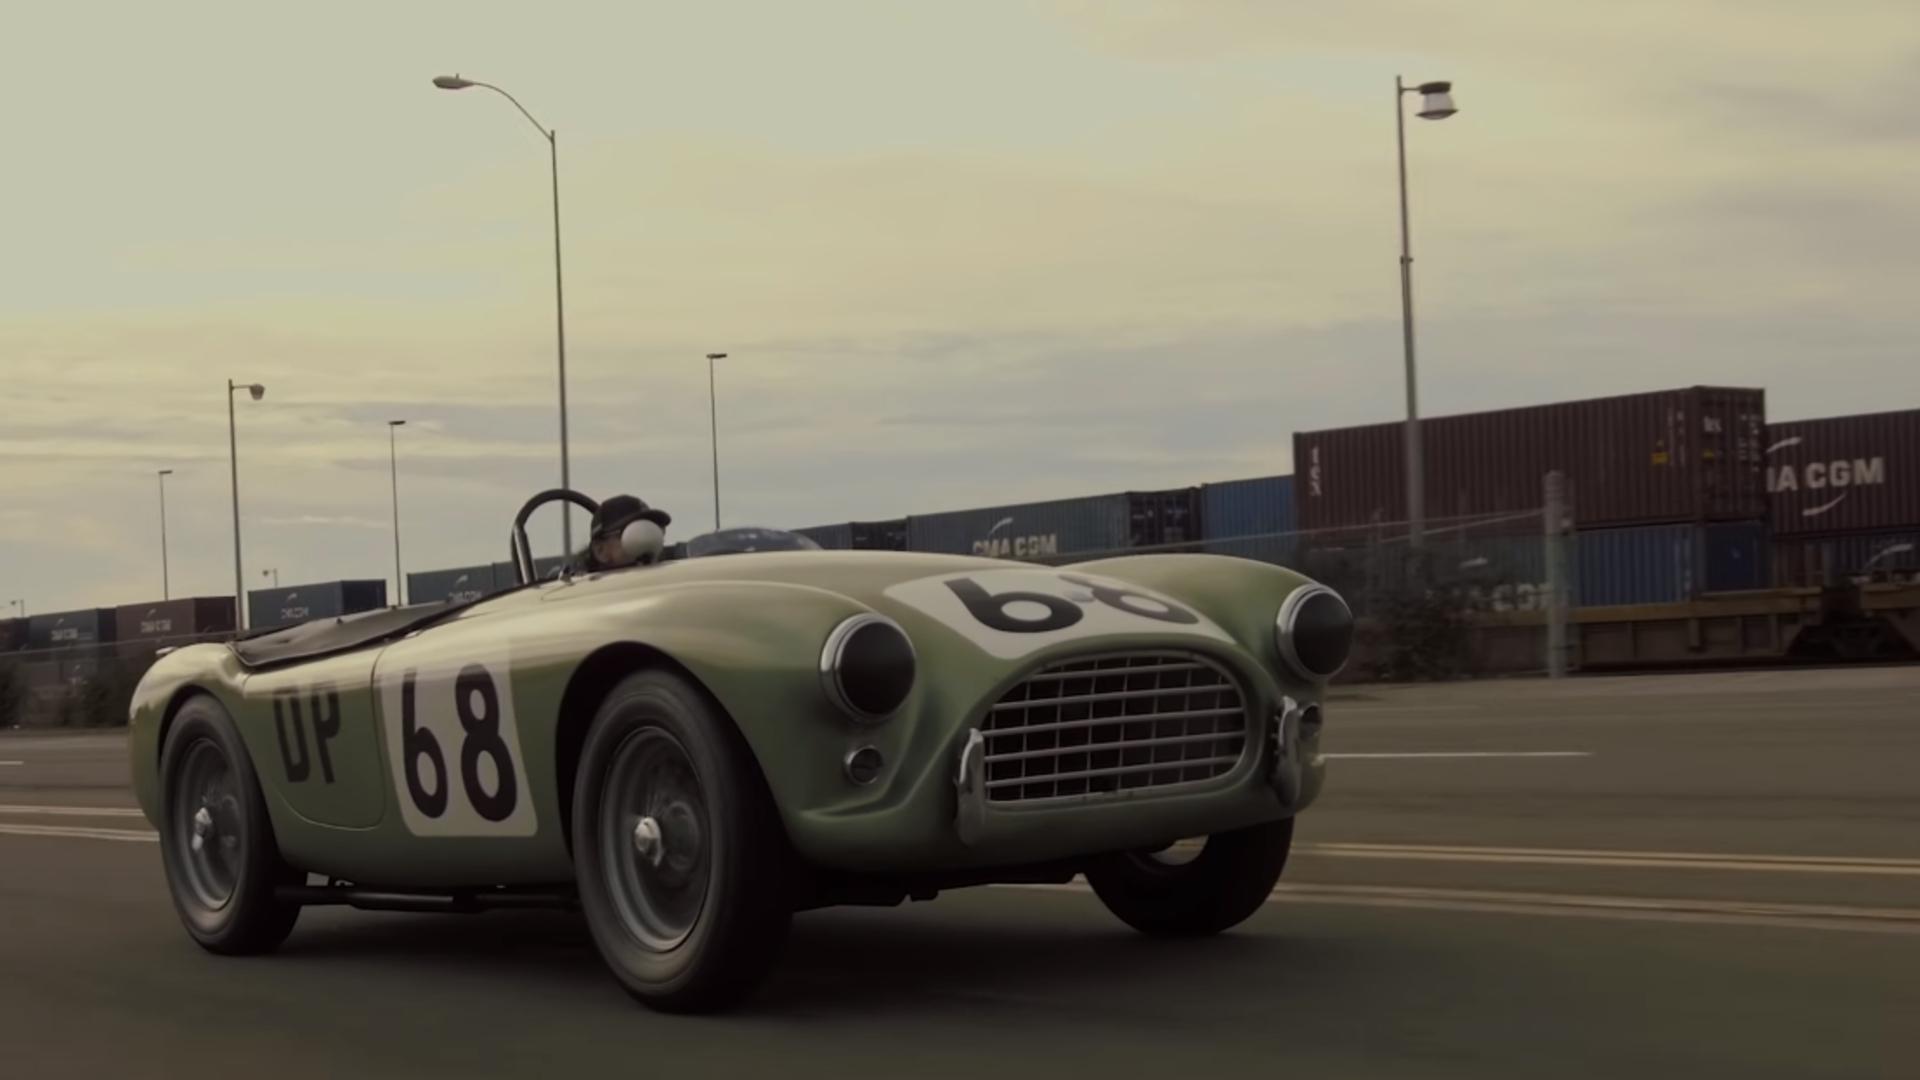 1962 AC Bristol: Los Angeles' Portside Racer